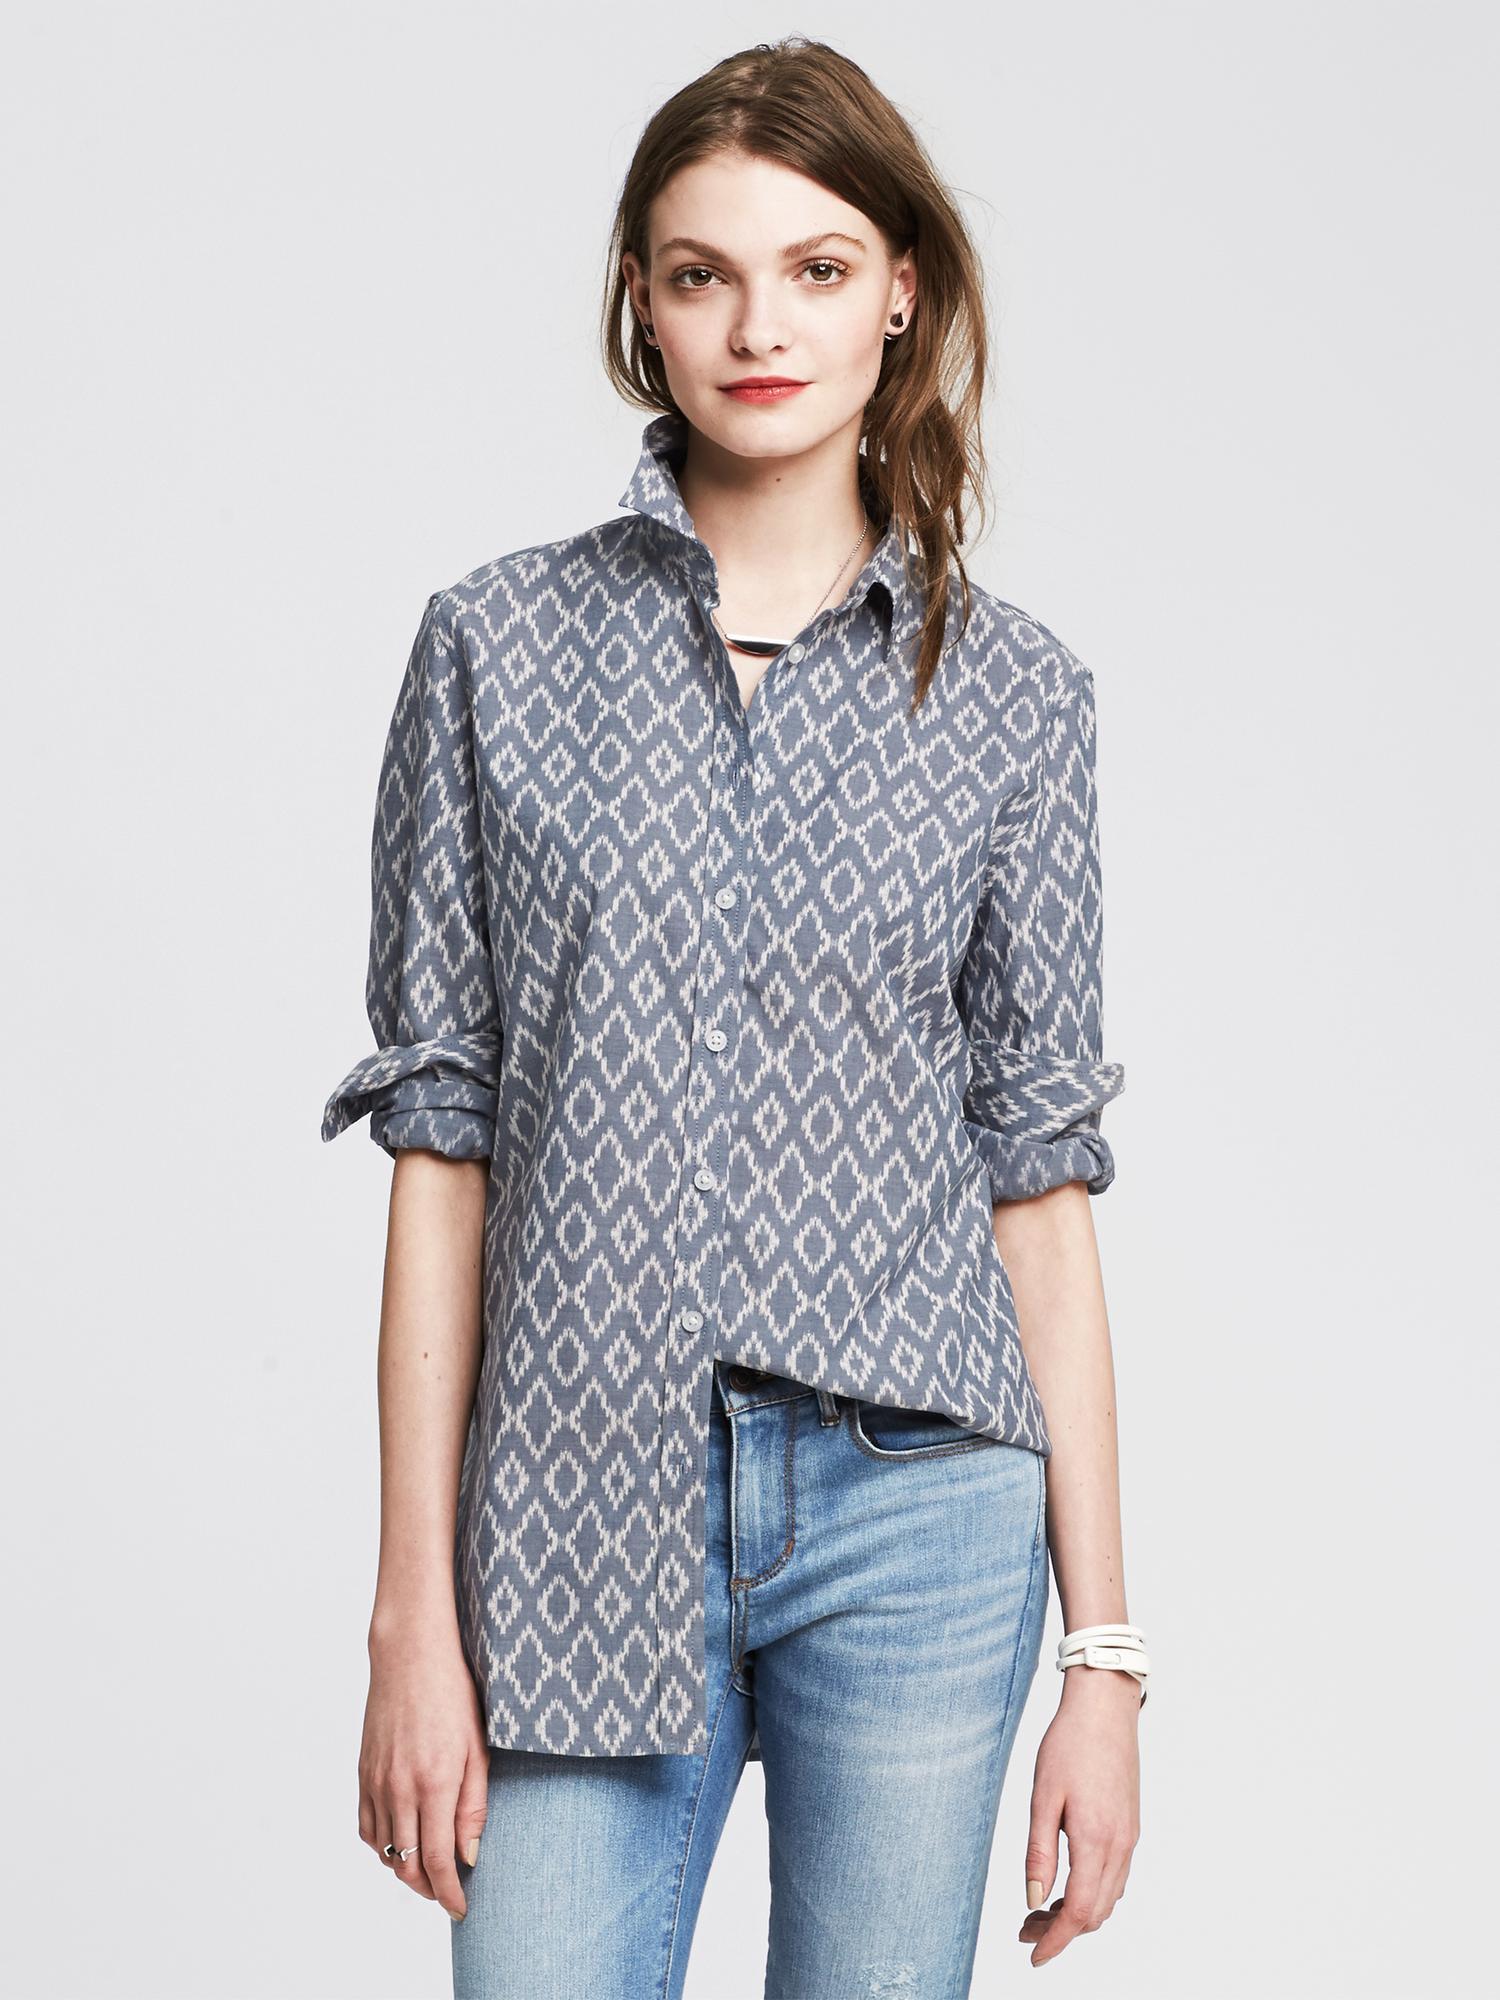 e0884f44054e Lyst - Banana Republic Soft-wash Ikat Chambray Shirt in Blue